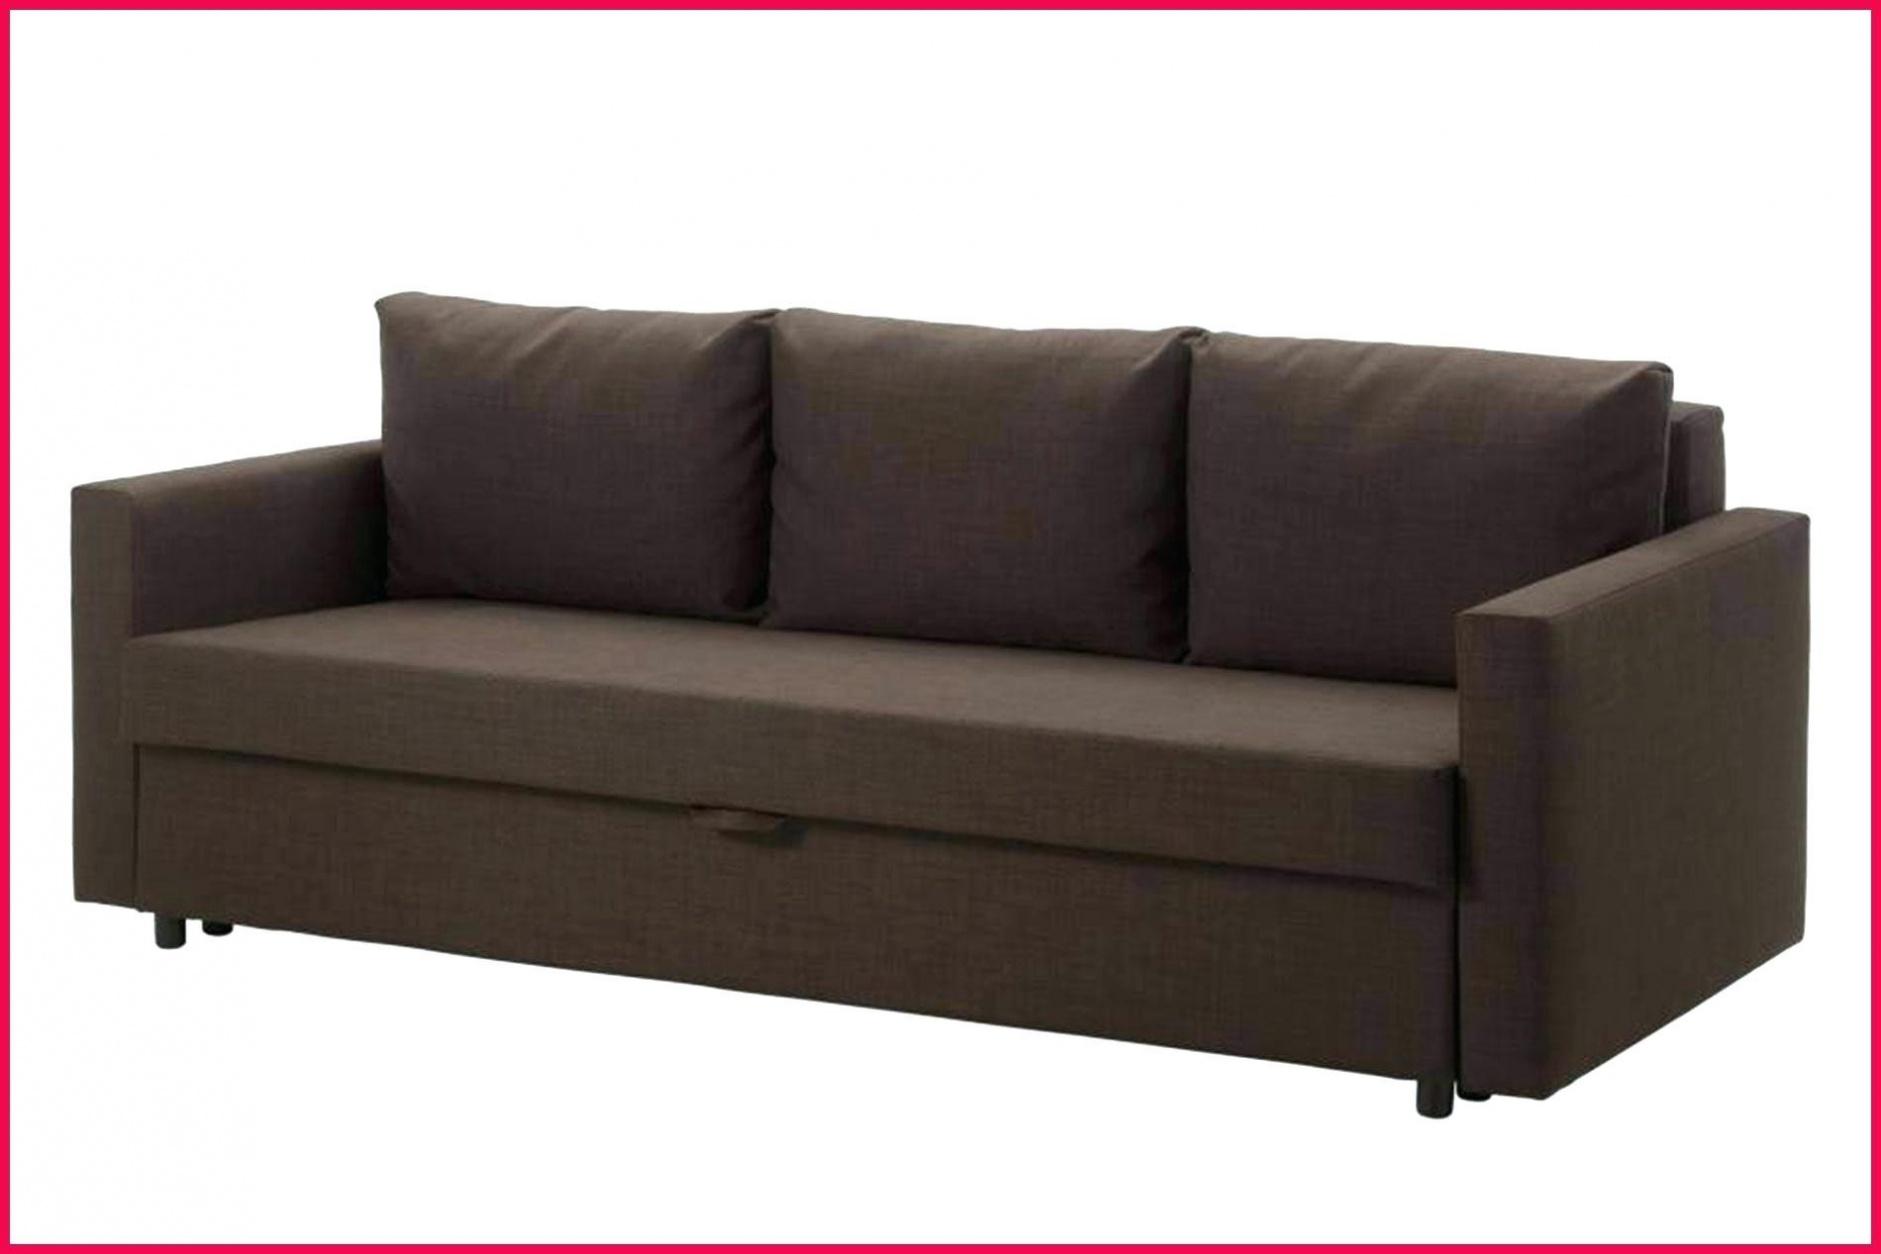 Ikea Canapé D Angle Convertible Luxe Photographie Maha De Jeté De Canapé Gris Mahagranda De Home